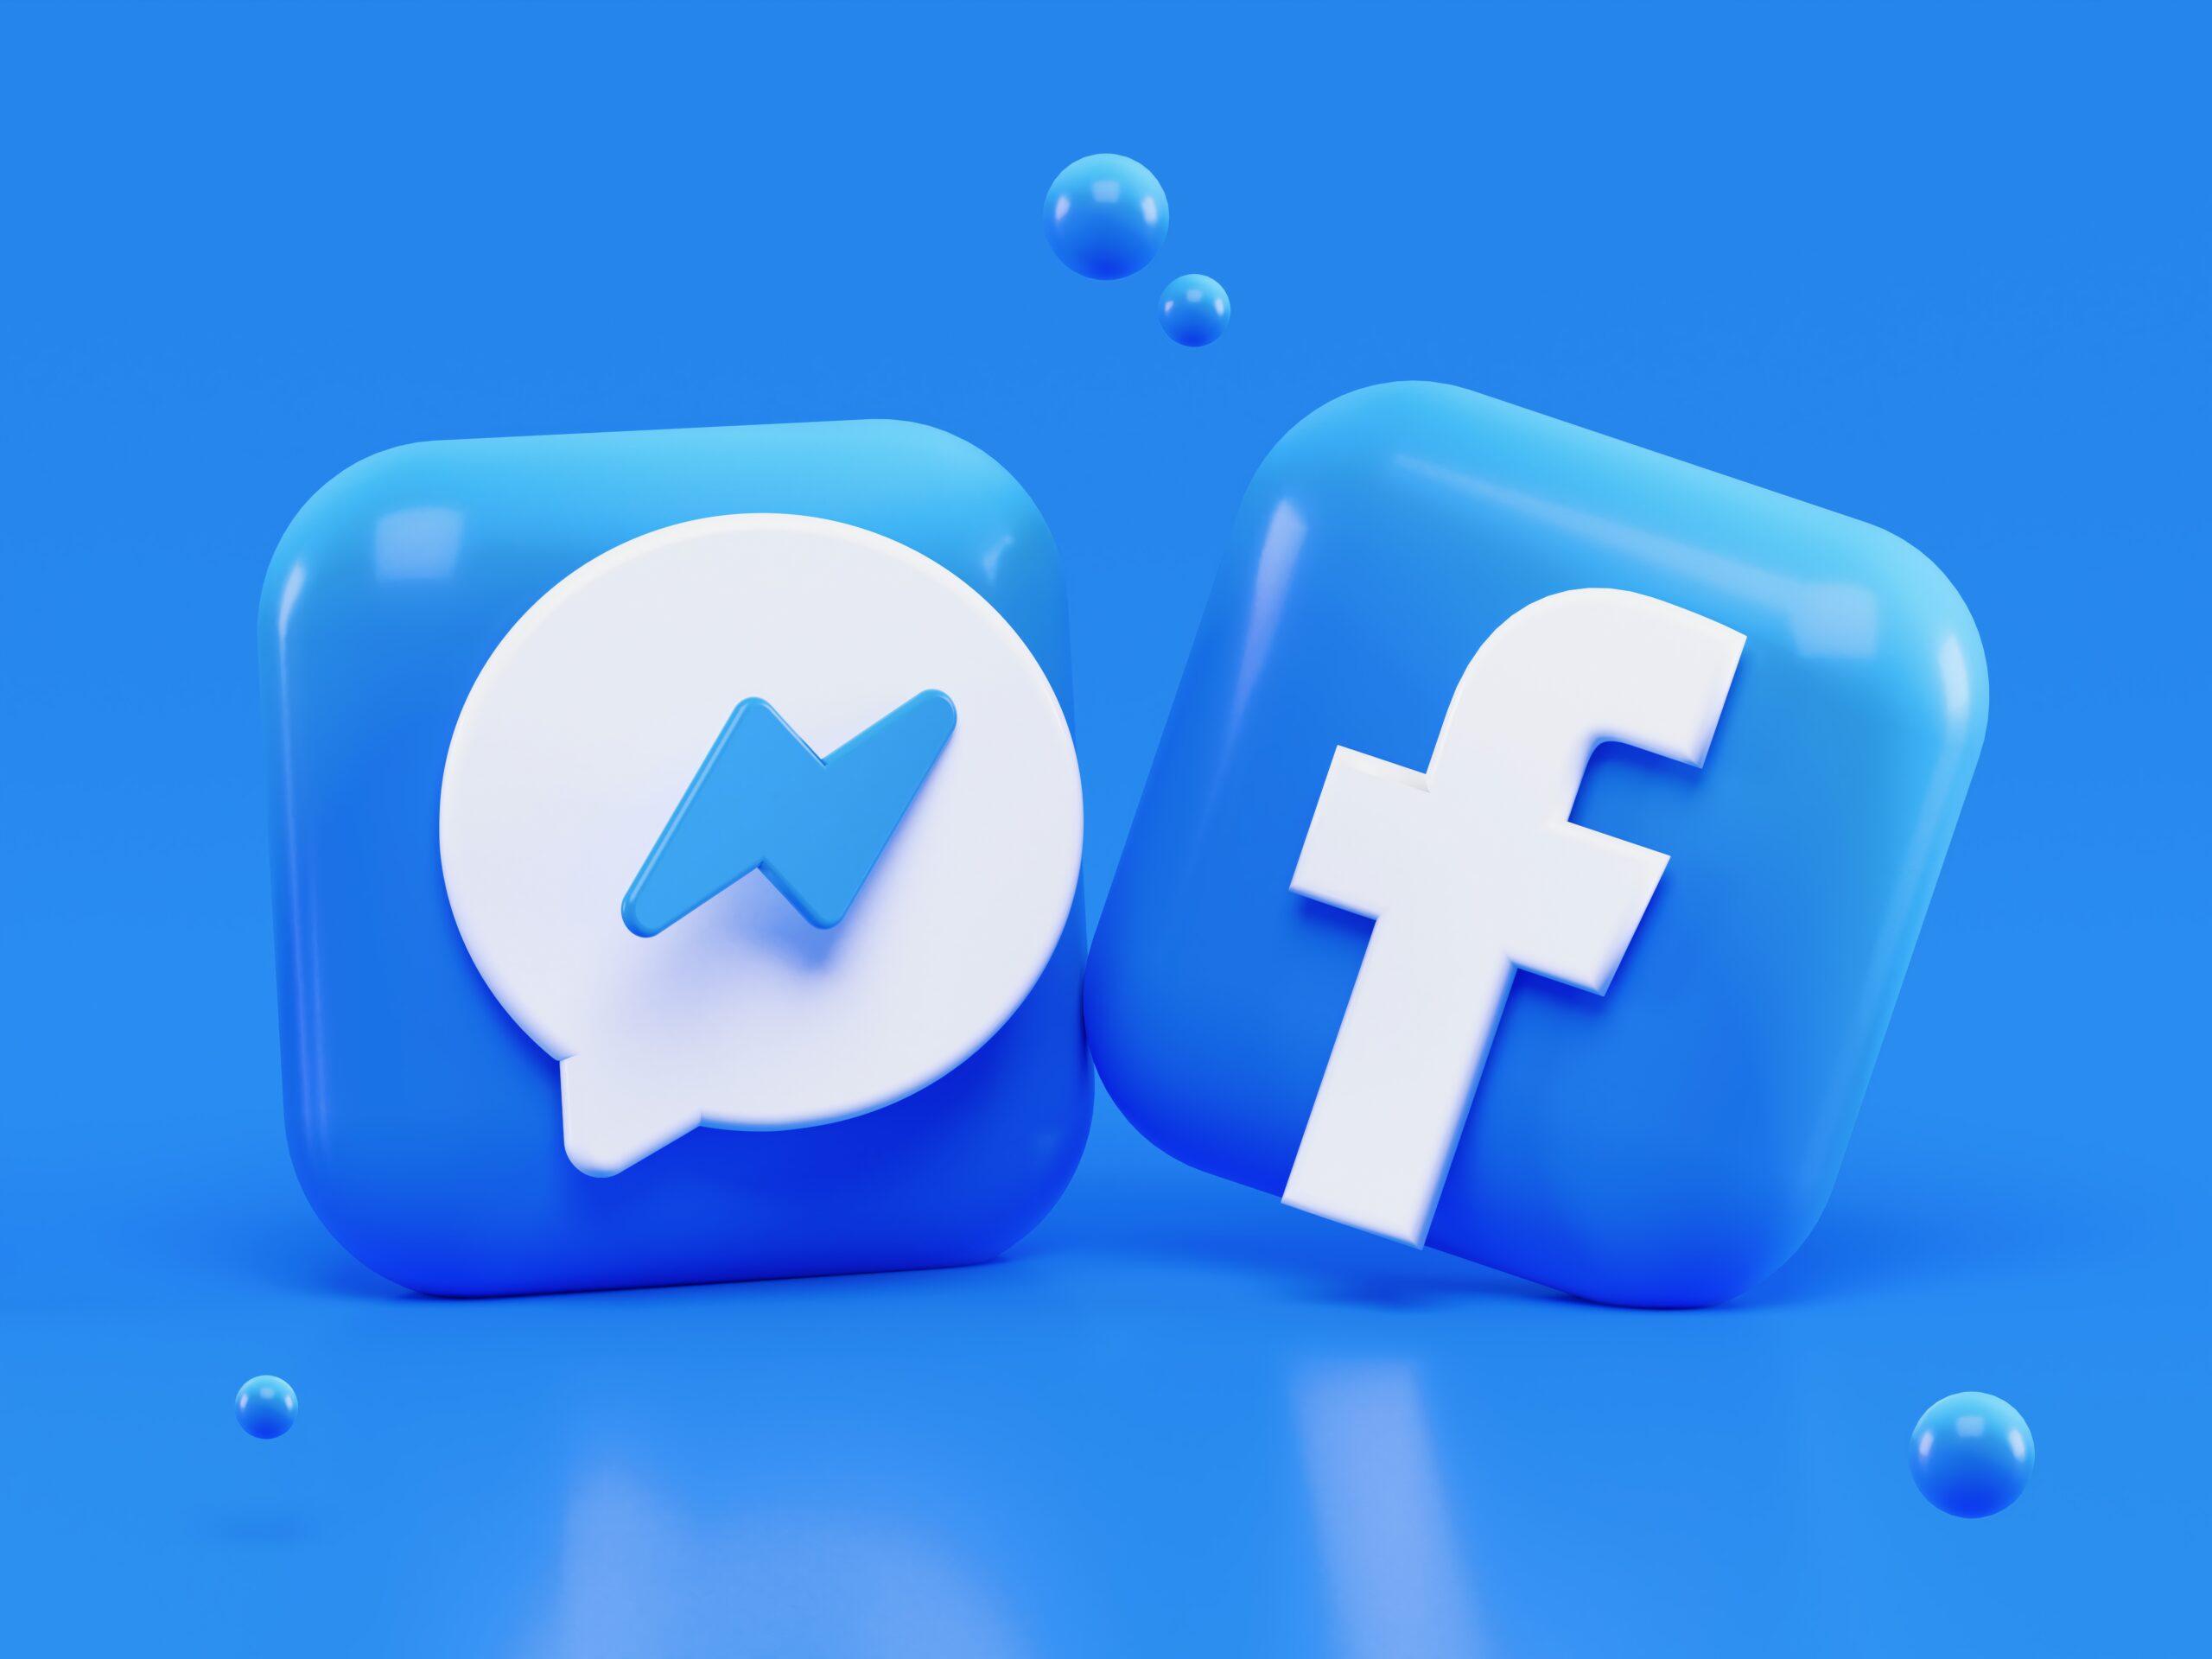 Quảng cáo online trên Facebook (Facebook Ads)